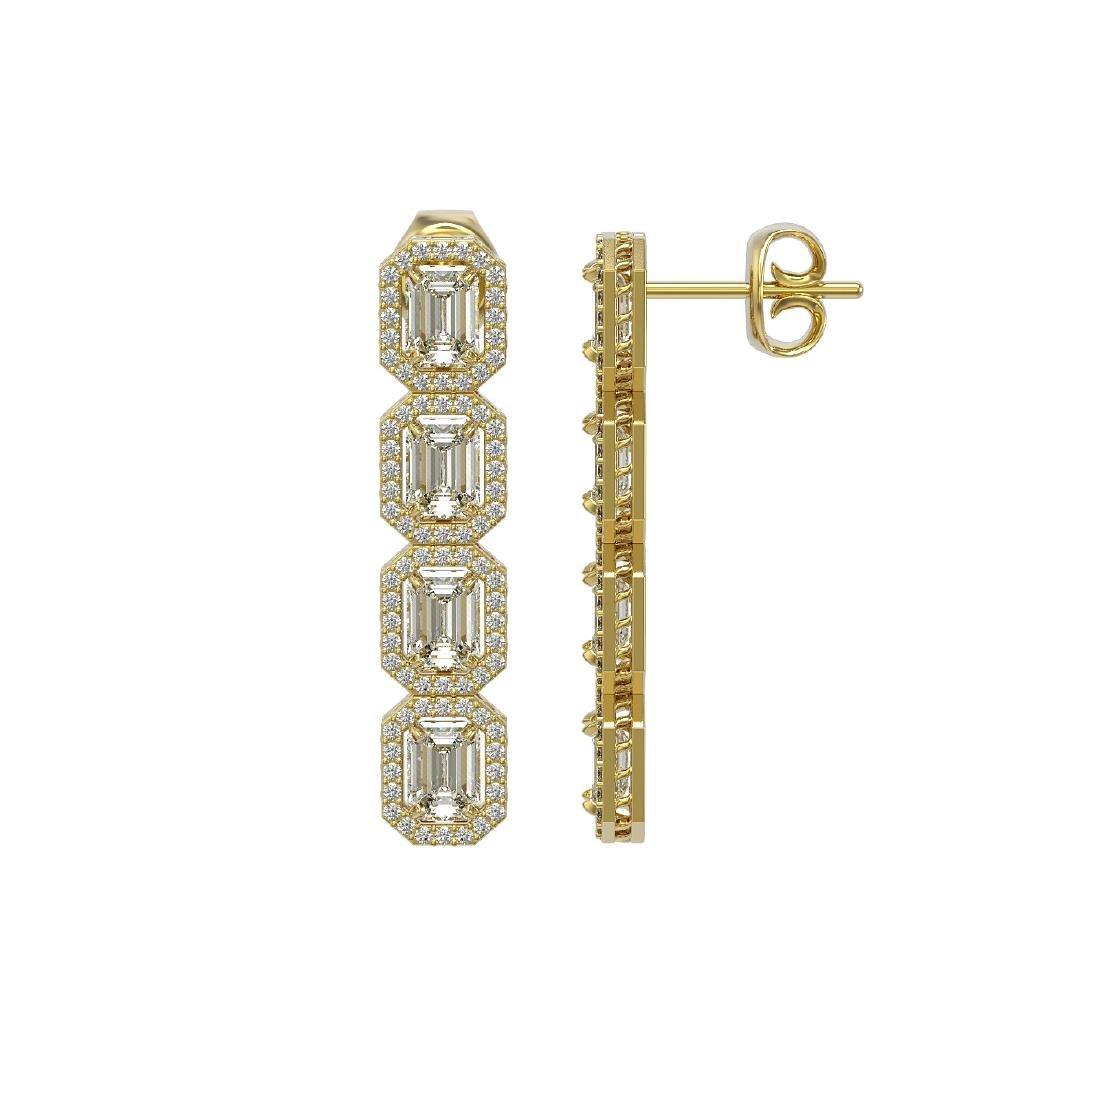 6.08 CTW Emerald Cut Diamond Designer Earrings 18K - 2